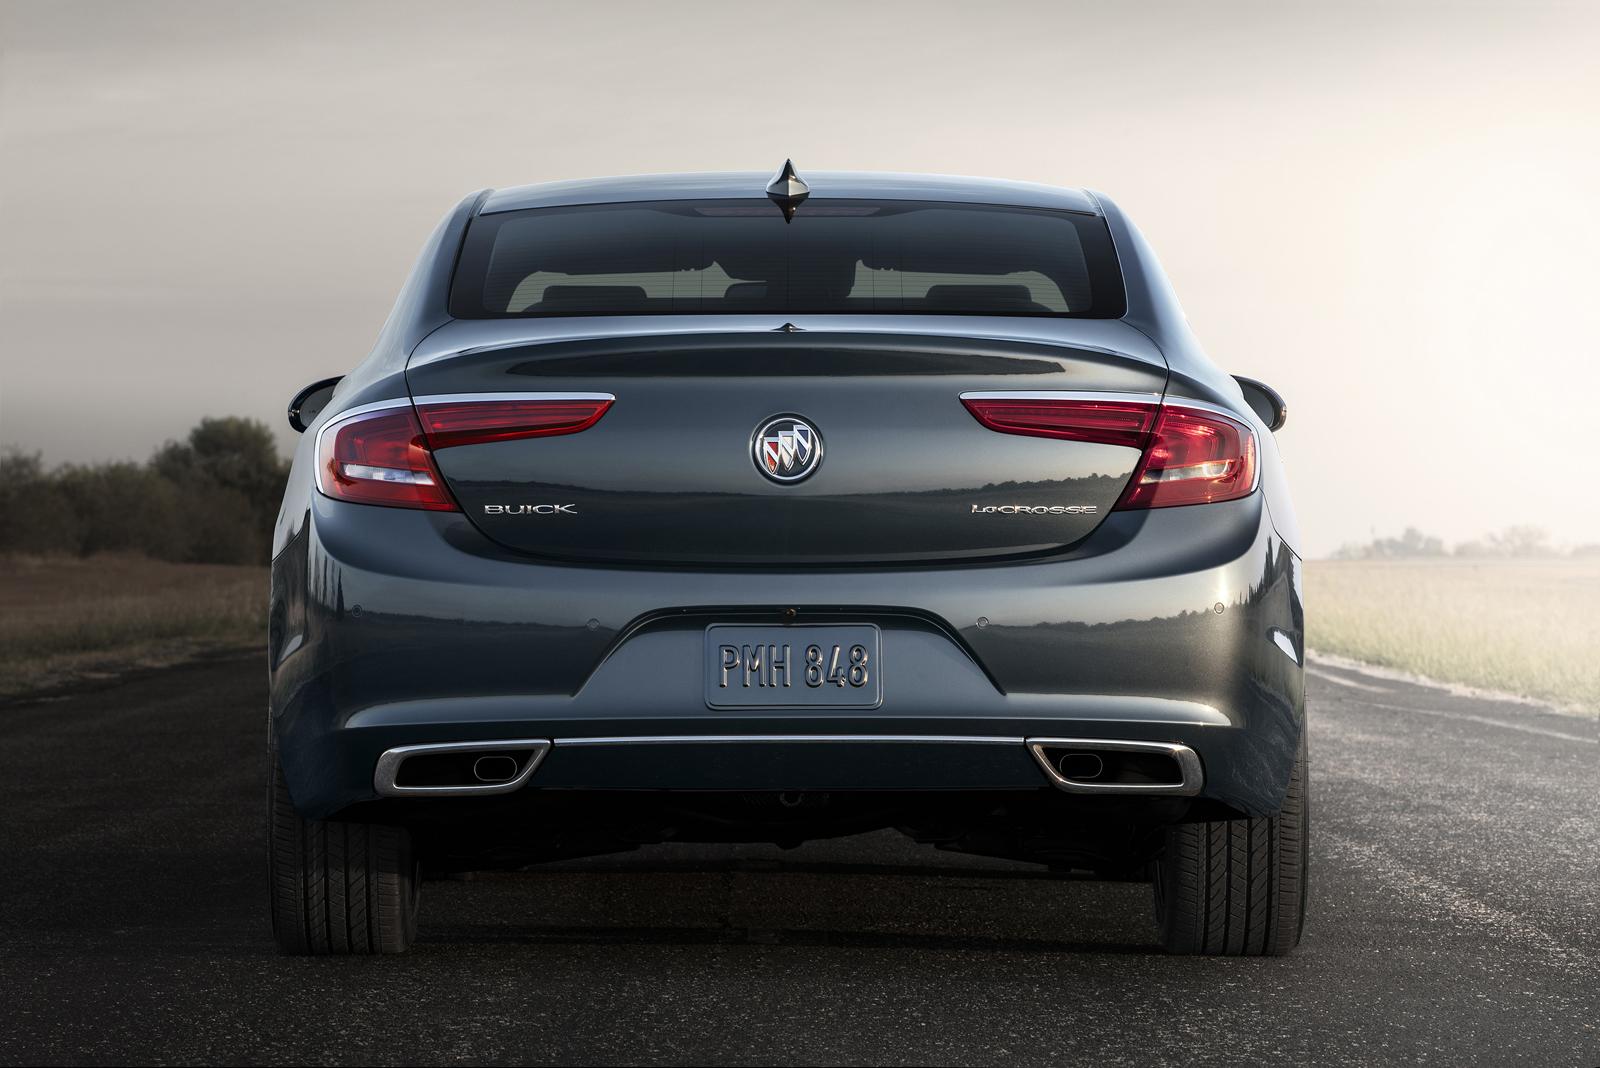 2018 Buick LaCrosse Avenir Demands a $3,700 Premium - GM Inside News